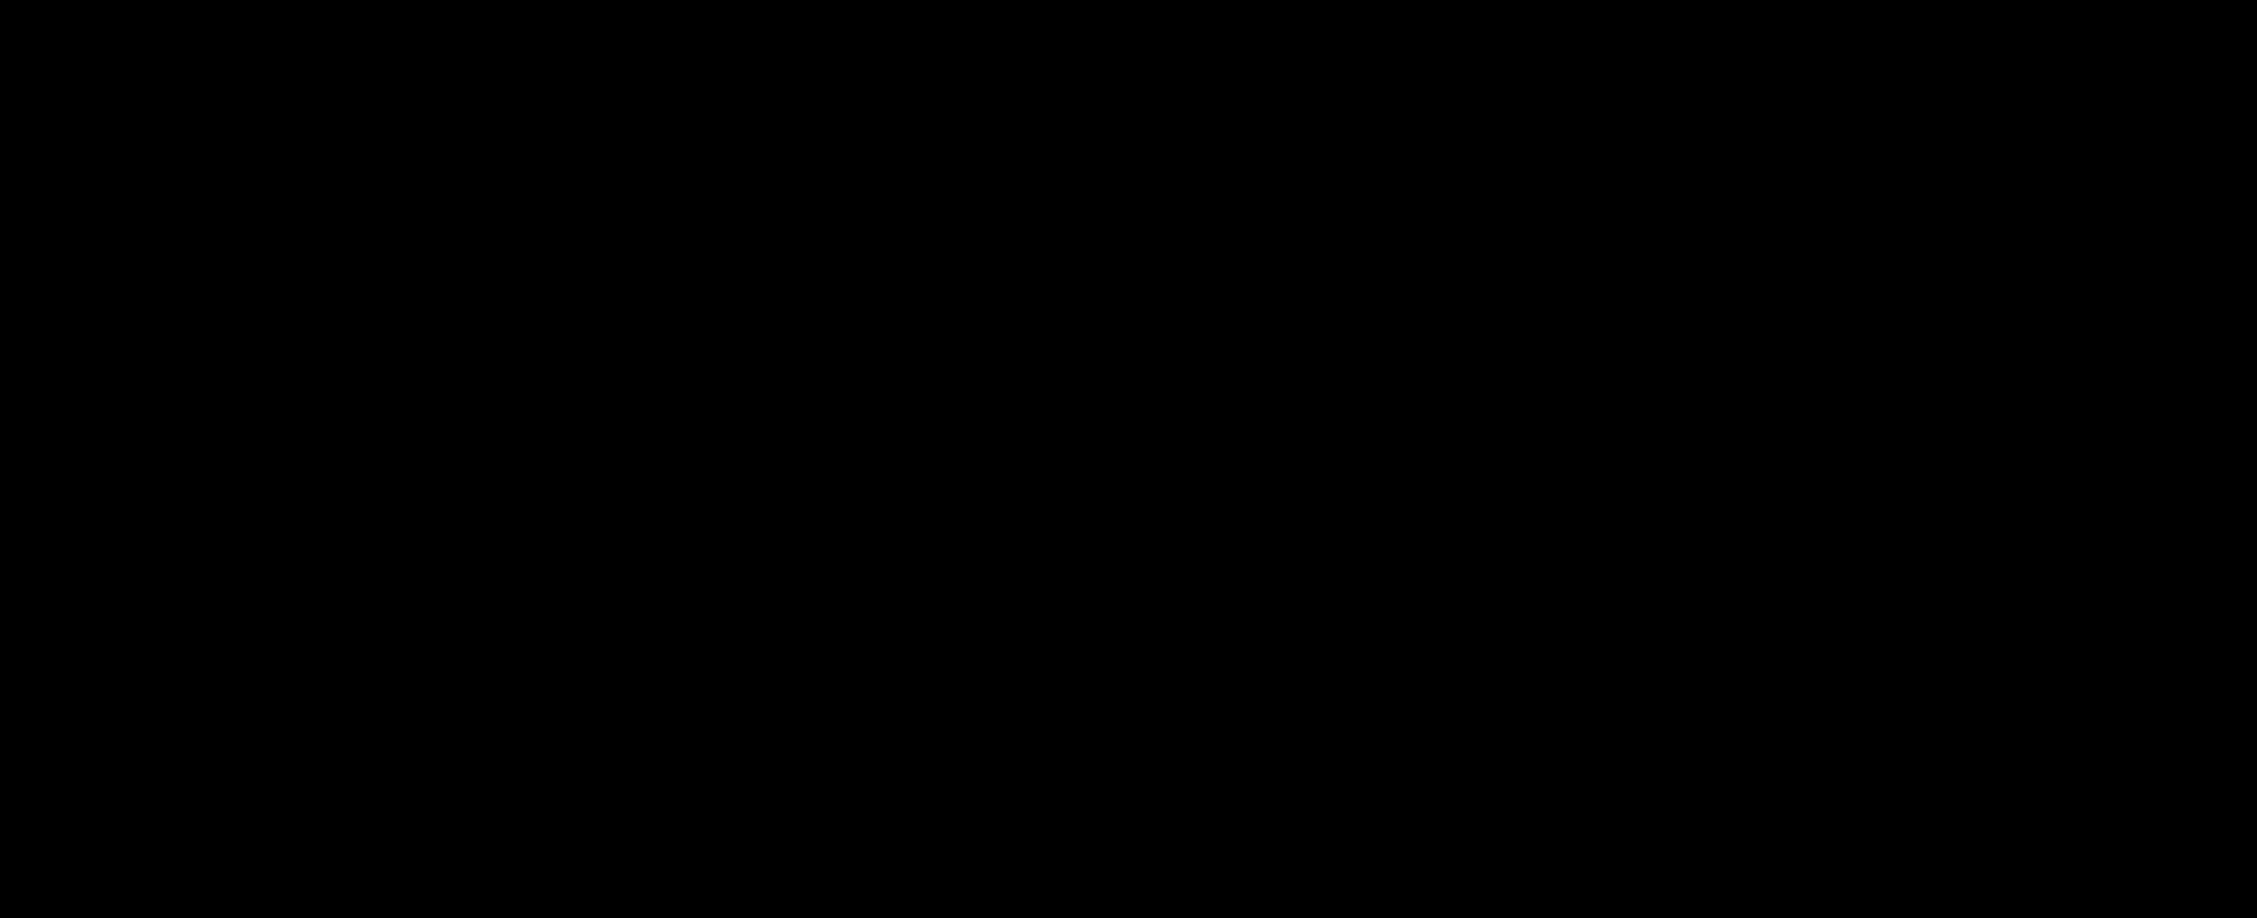 T63-<sup>13</sup>C, d<sub>3</sub>